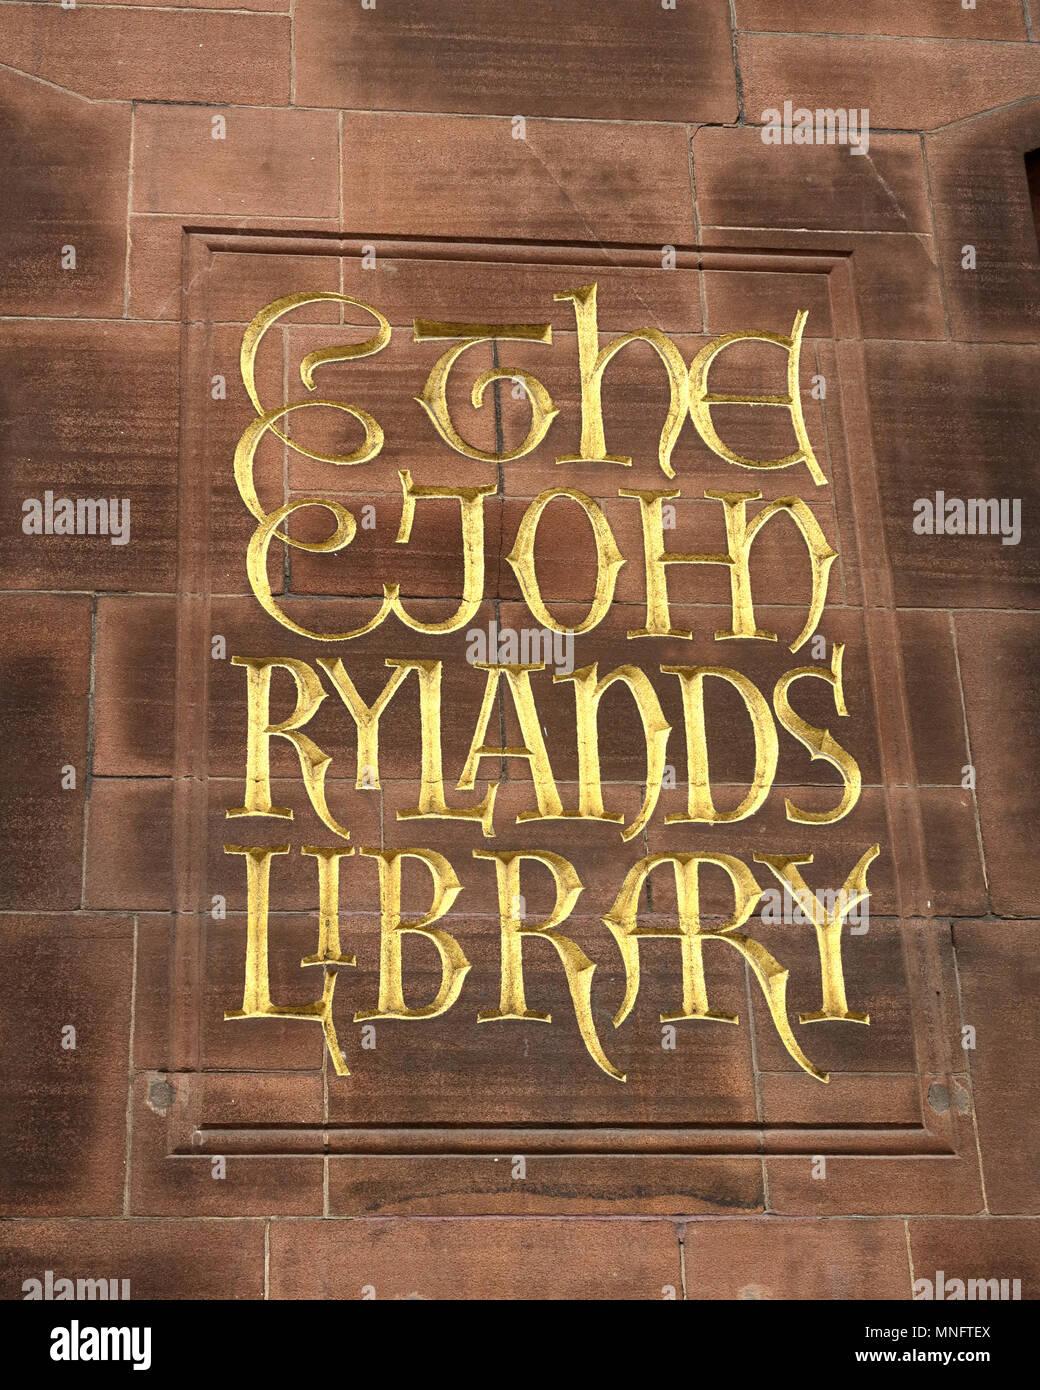 John Rylands Library, Deansgate, Manchester, Lancashire, England, UK - Stock Image